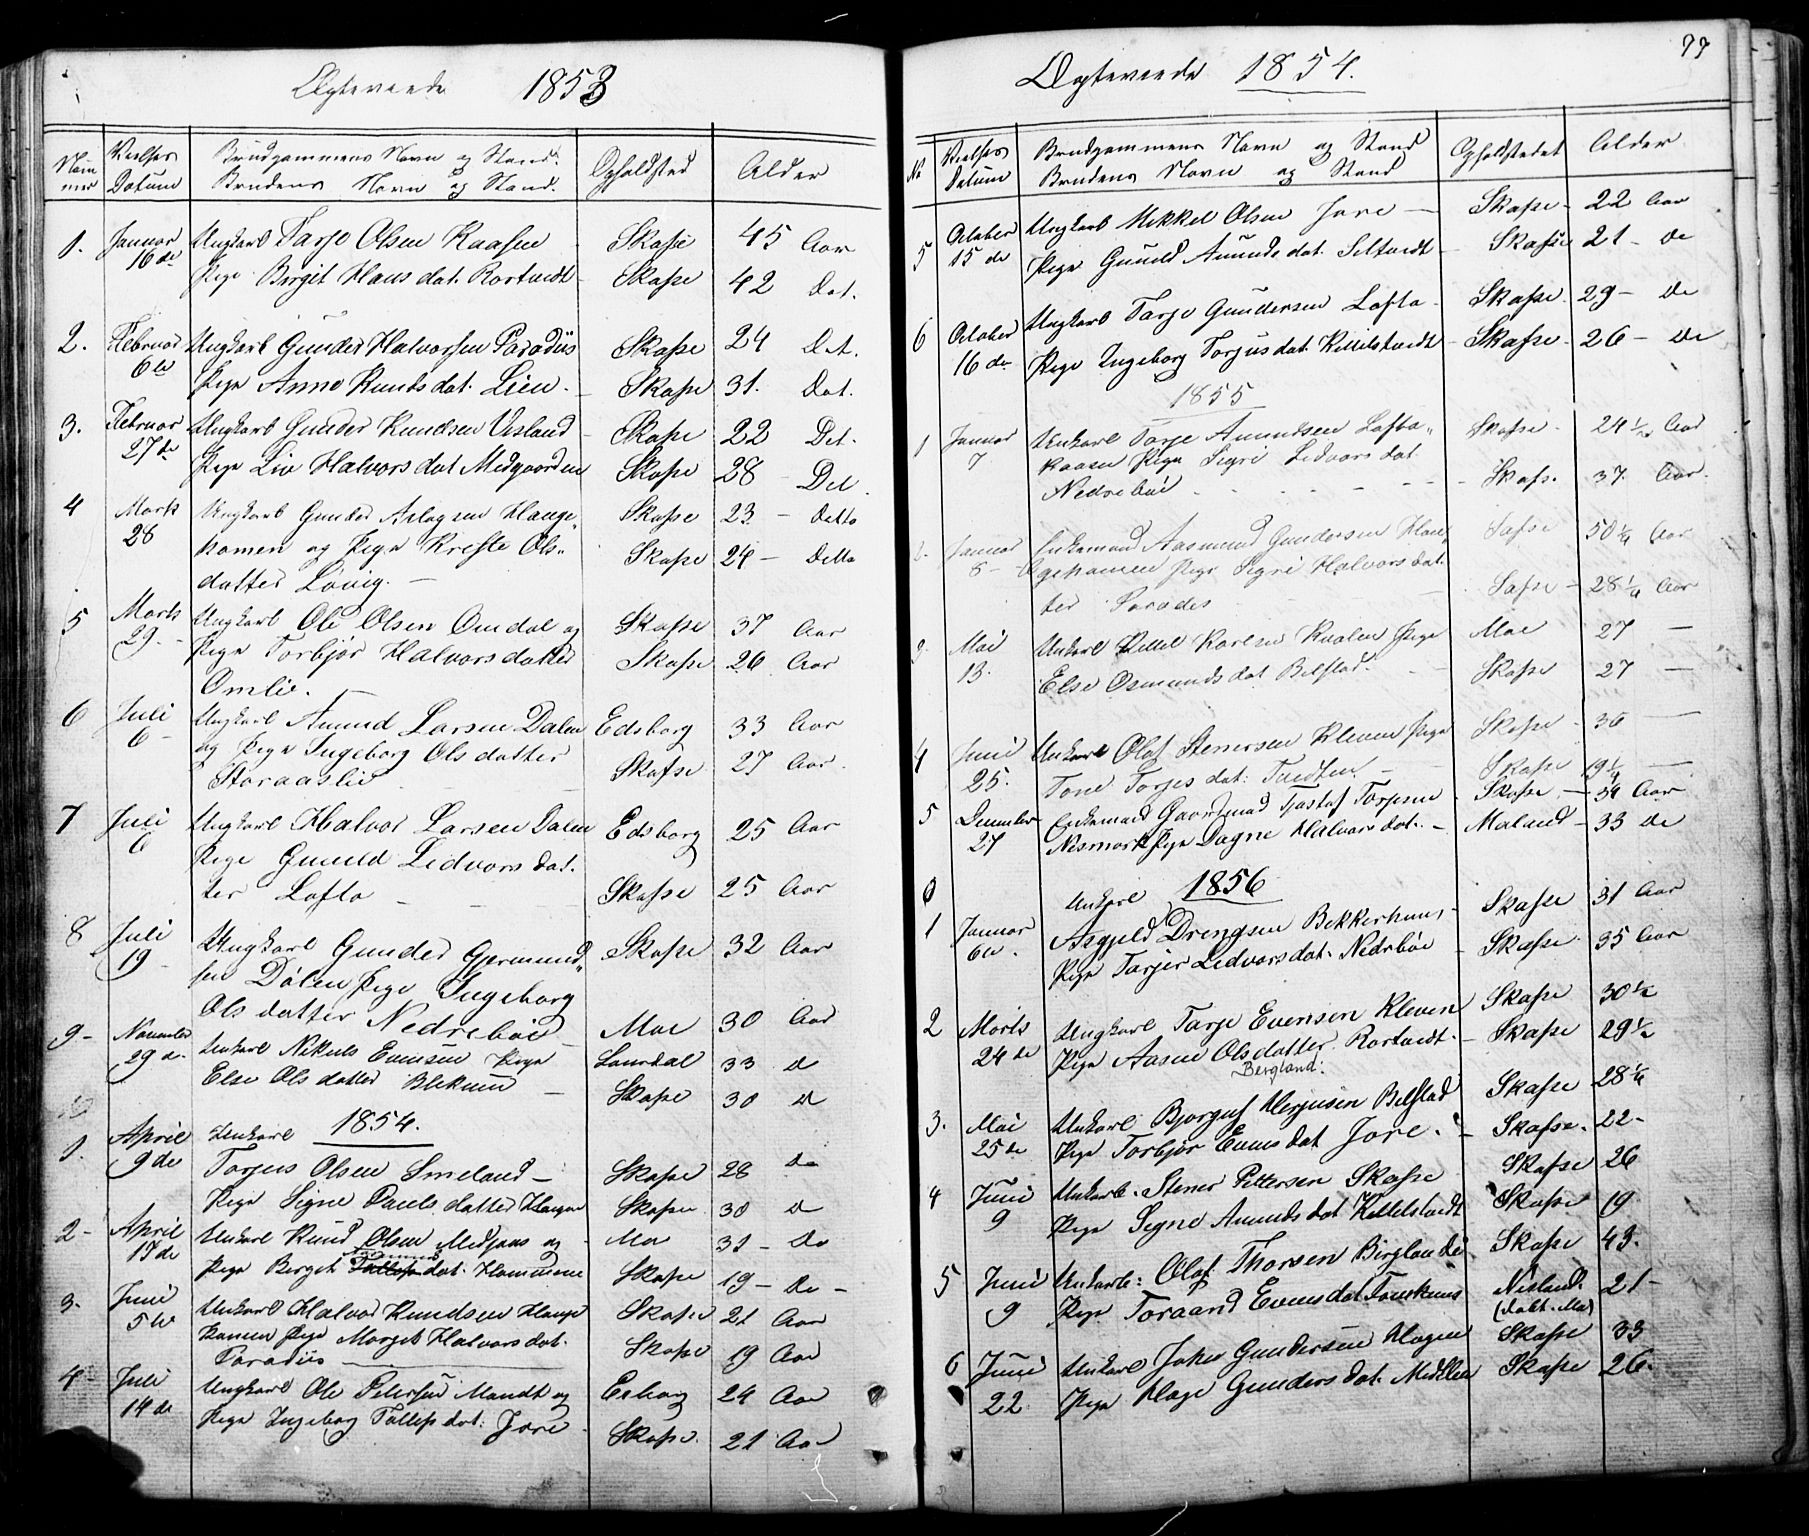 SAKO, Mo kirkebøker, G/Gb/L0002: Klokkerbok nr. II 2, 1851-1890, s. 77